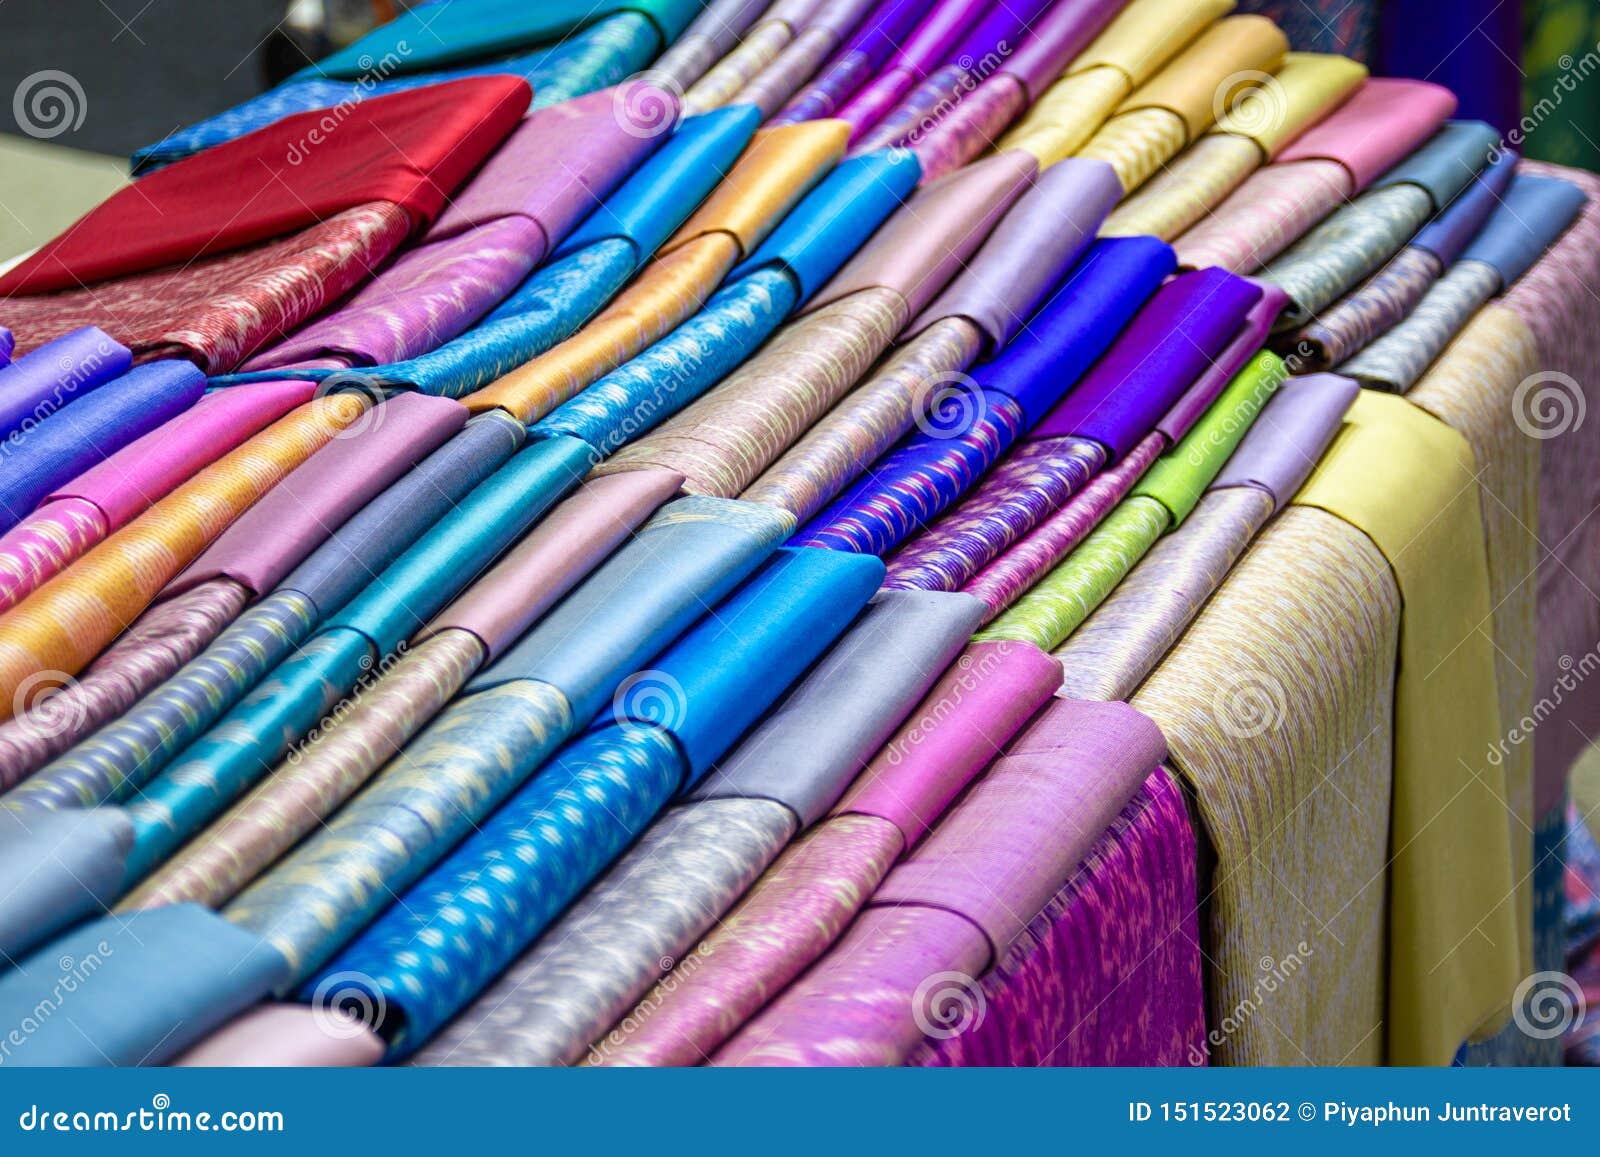 Thai Silk Fabric - Handmade Woven Fabrics Of Thai Silk